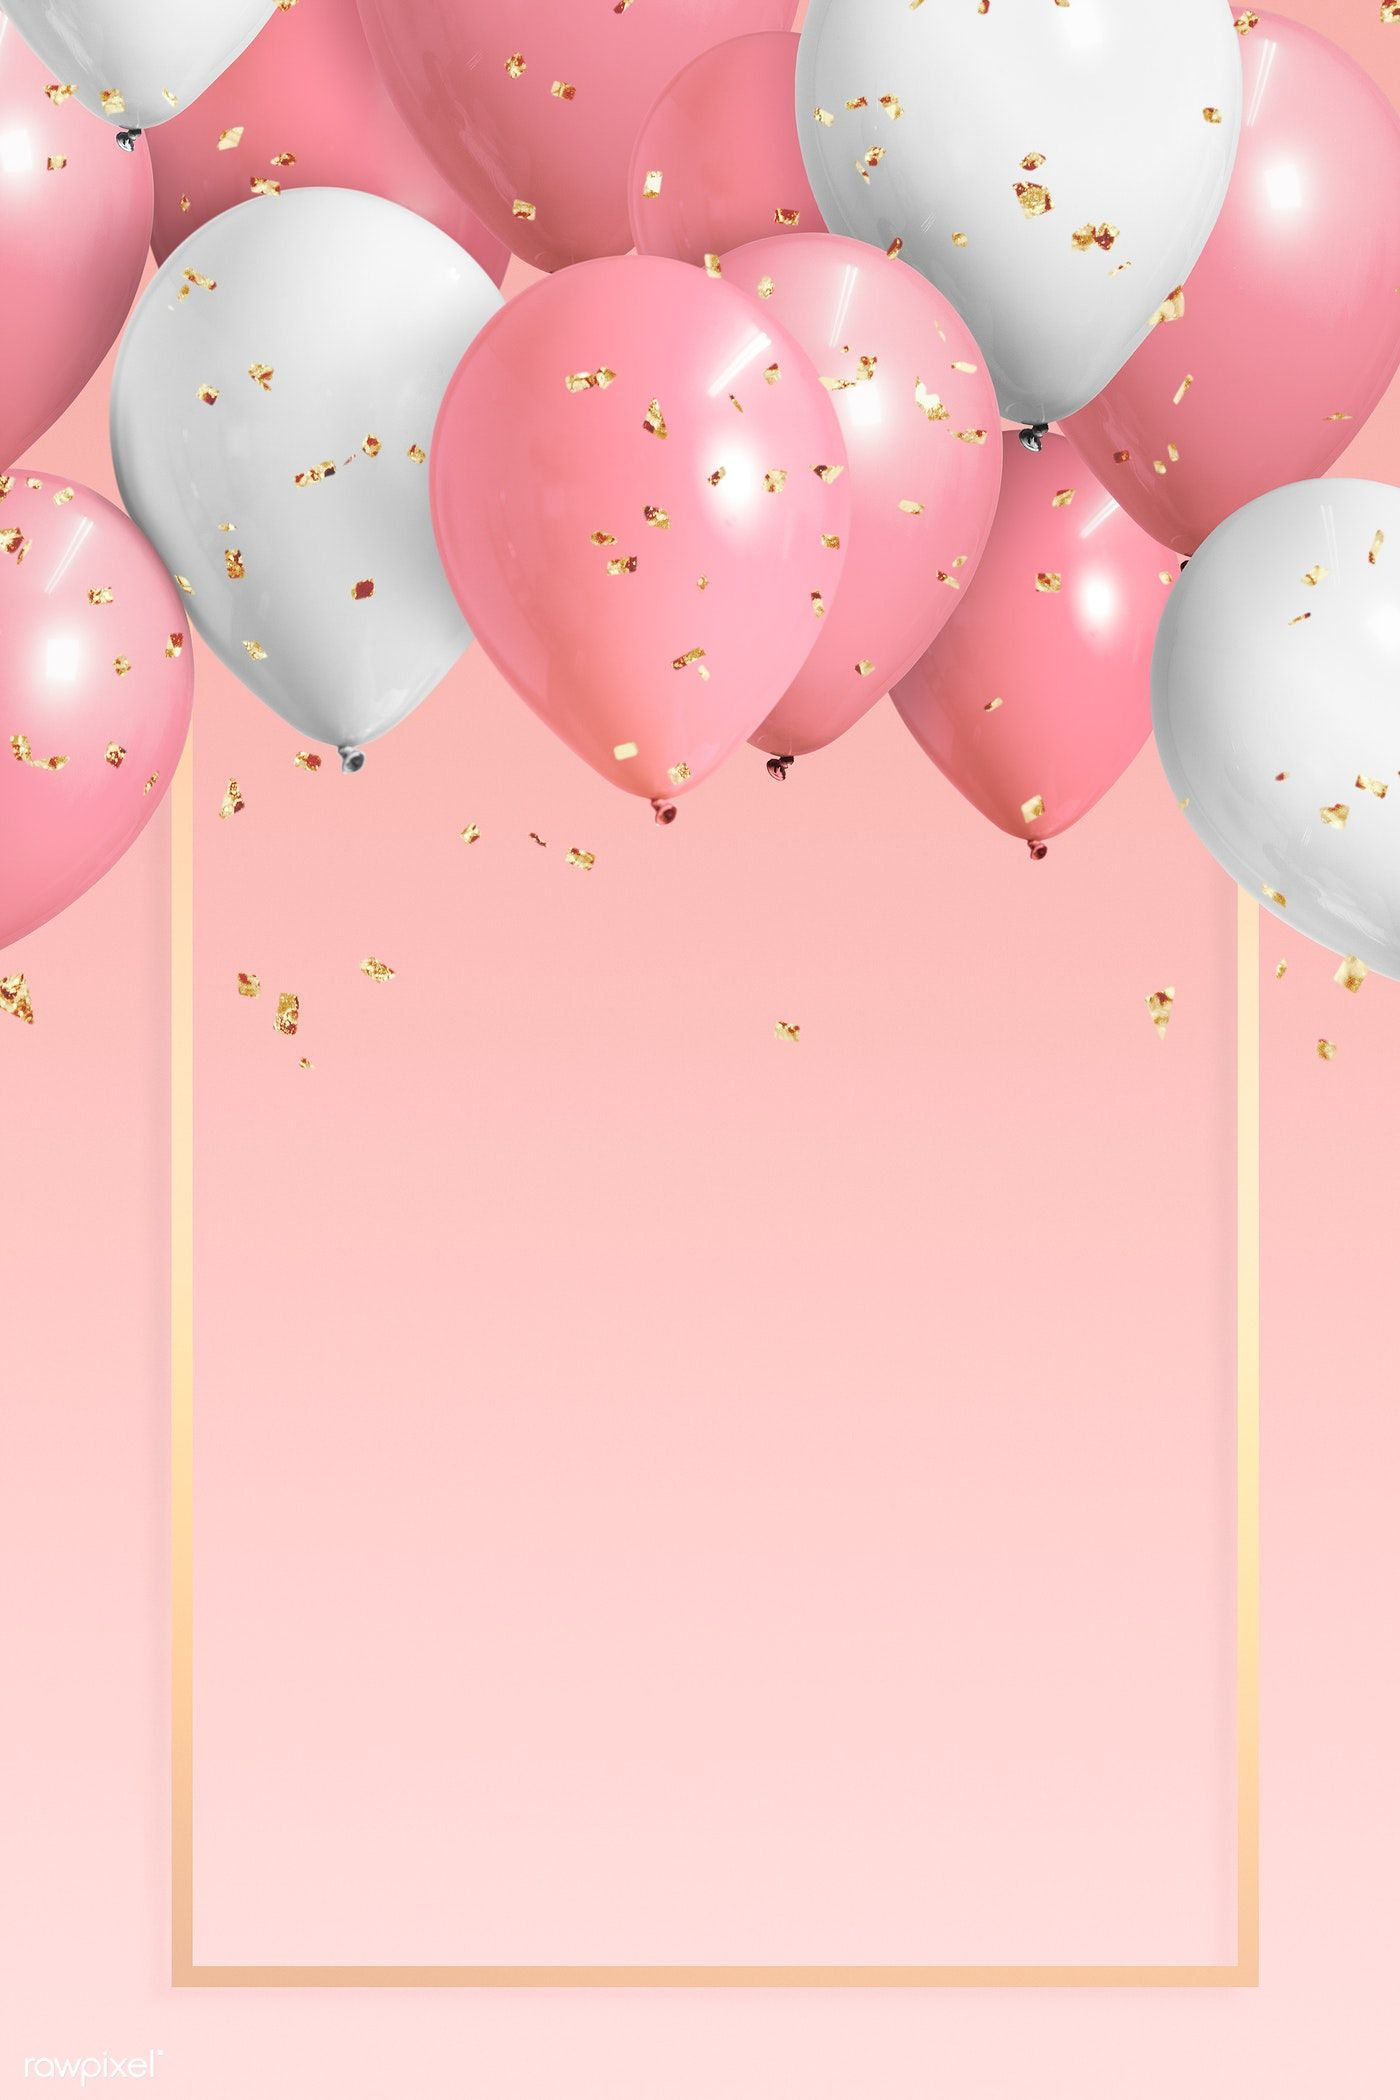 Download premium illustration of Golden frame balloons on